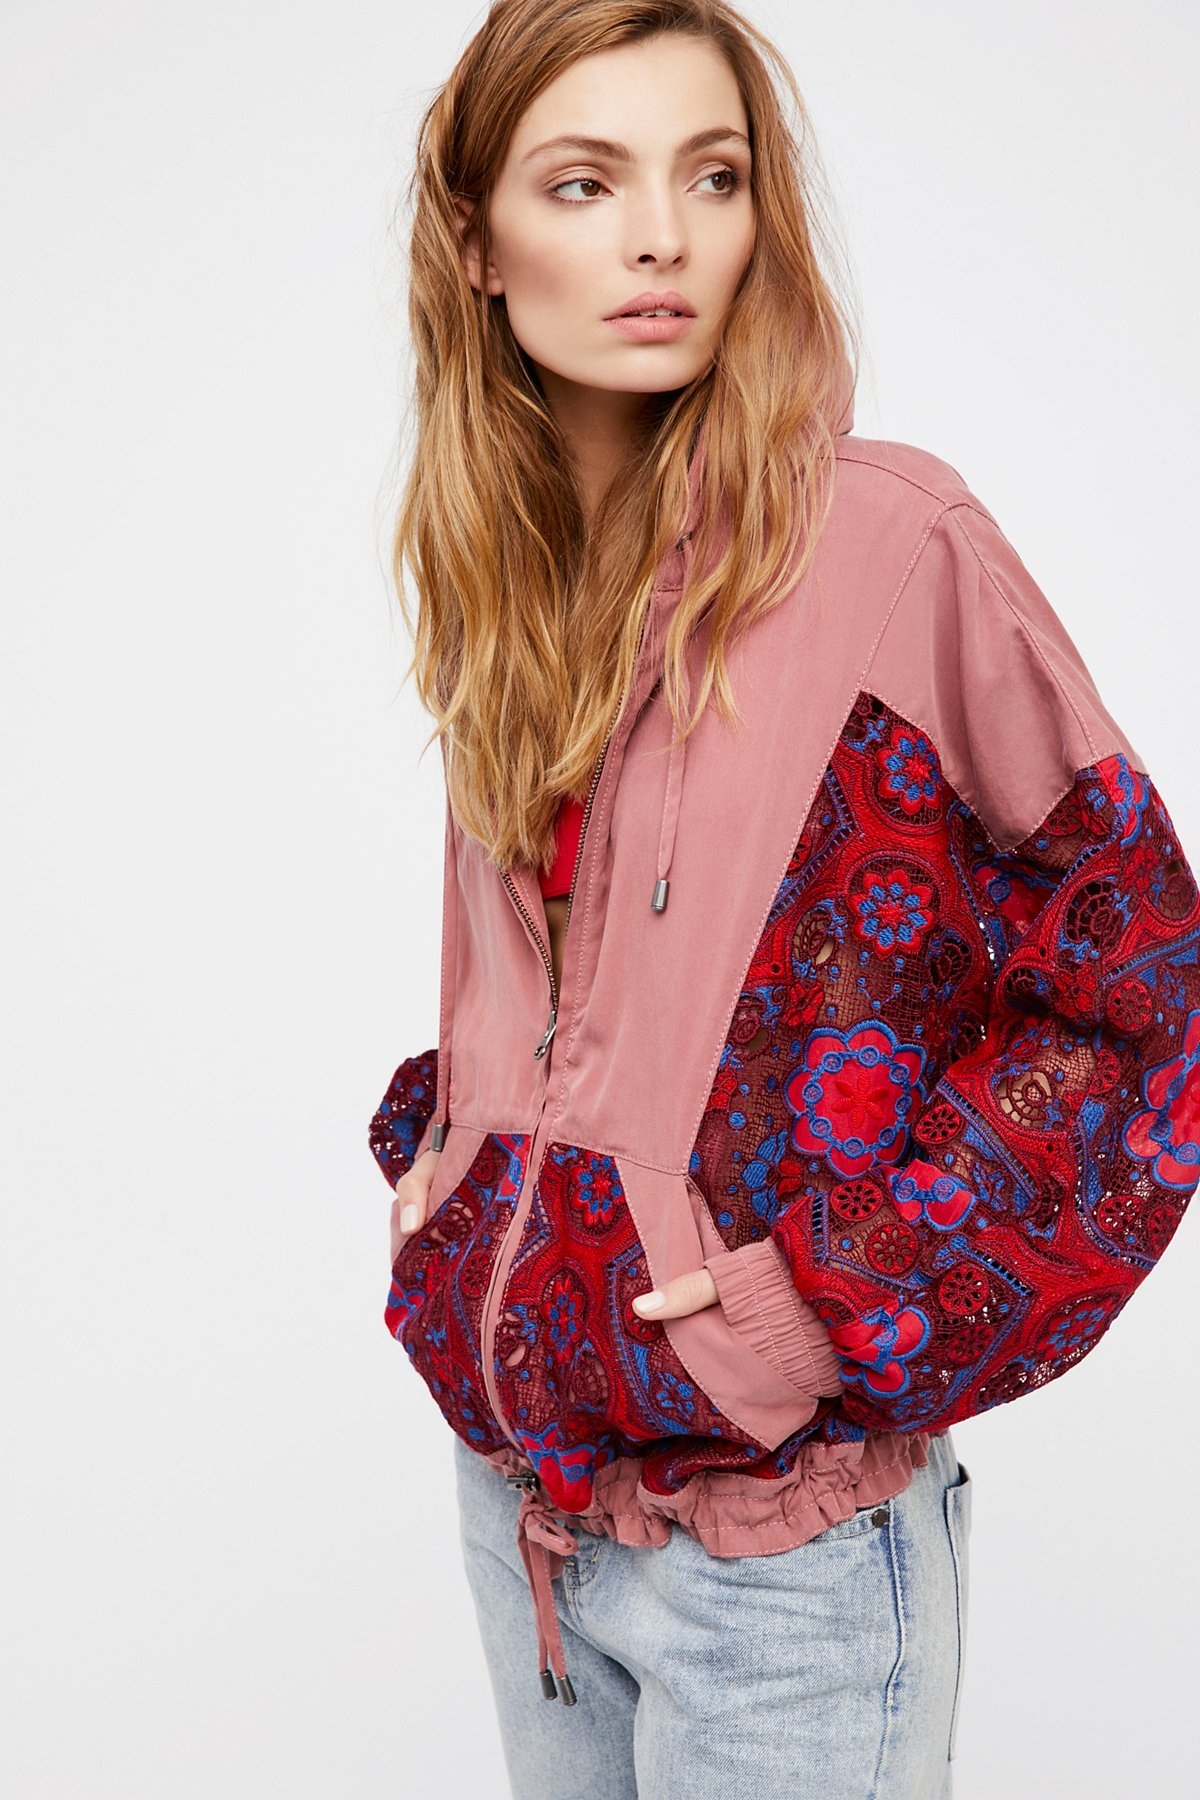 Magpie超大款蕾丝夹克